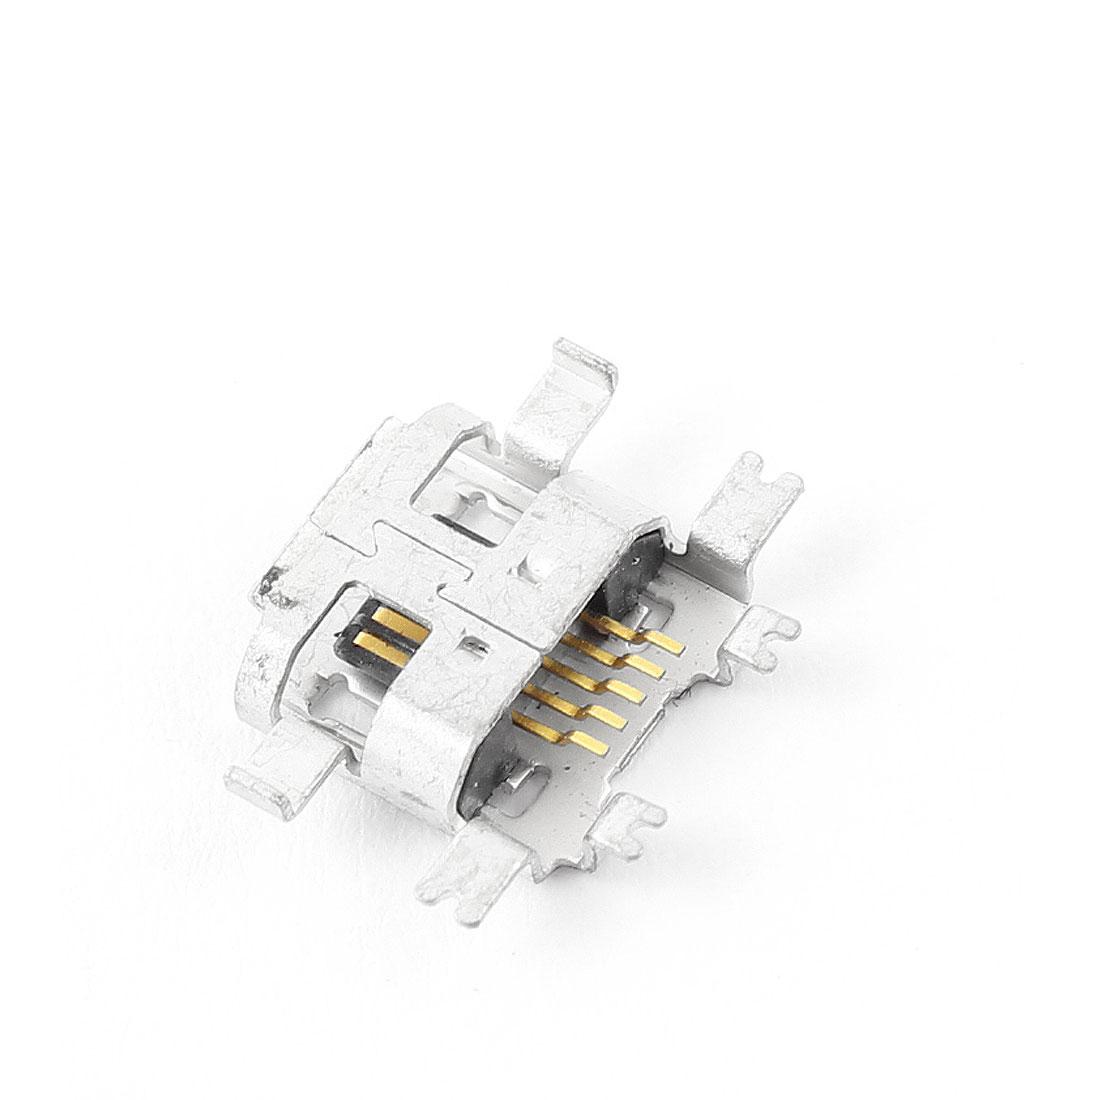 Repair Parts Type B Micro USB Female 5 Pin Jack Port Socket Connector